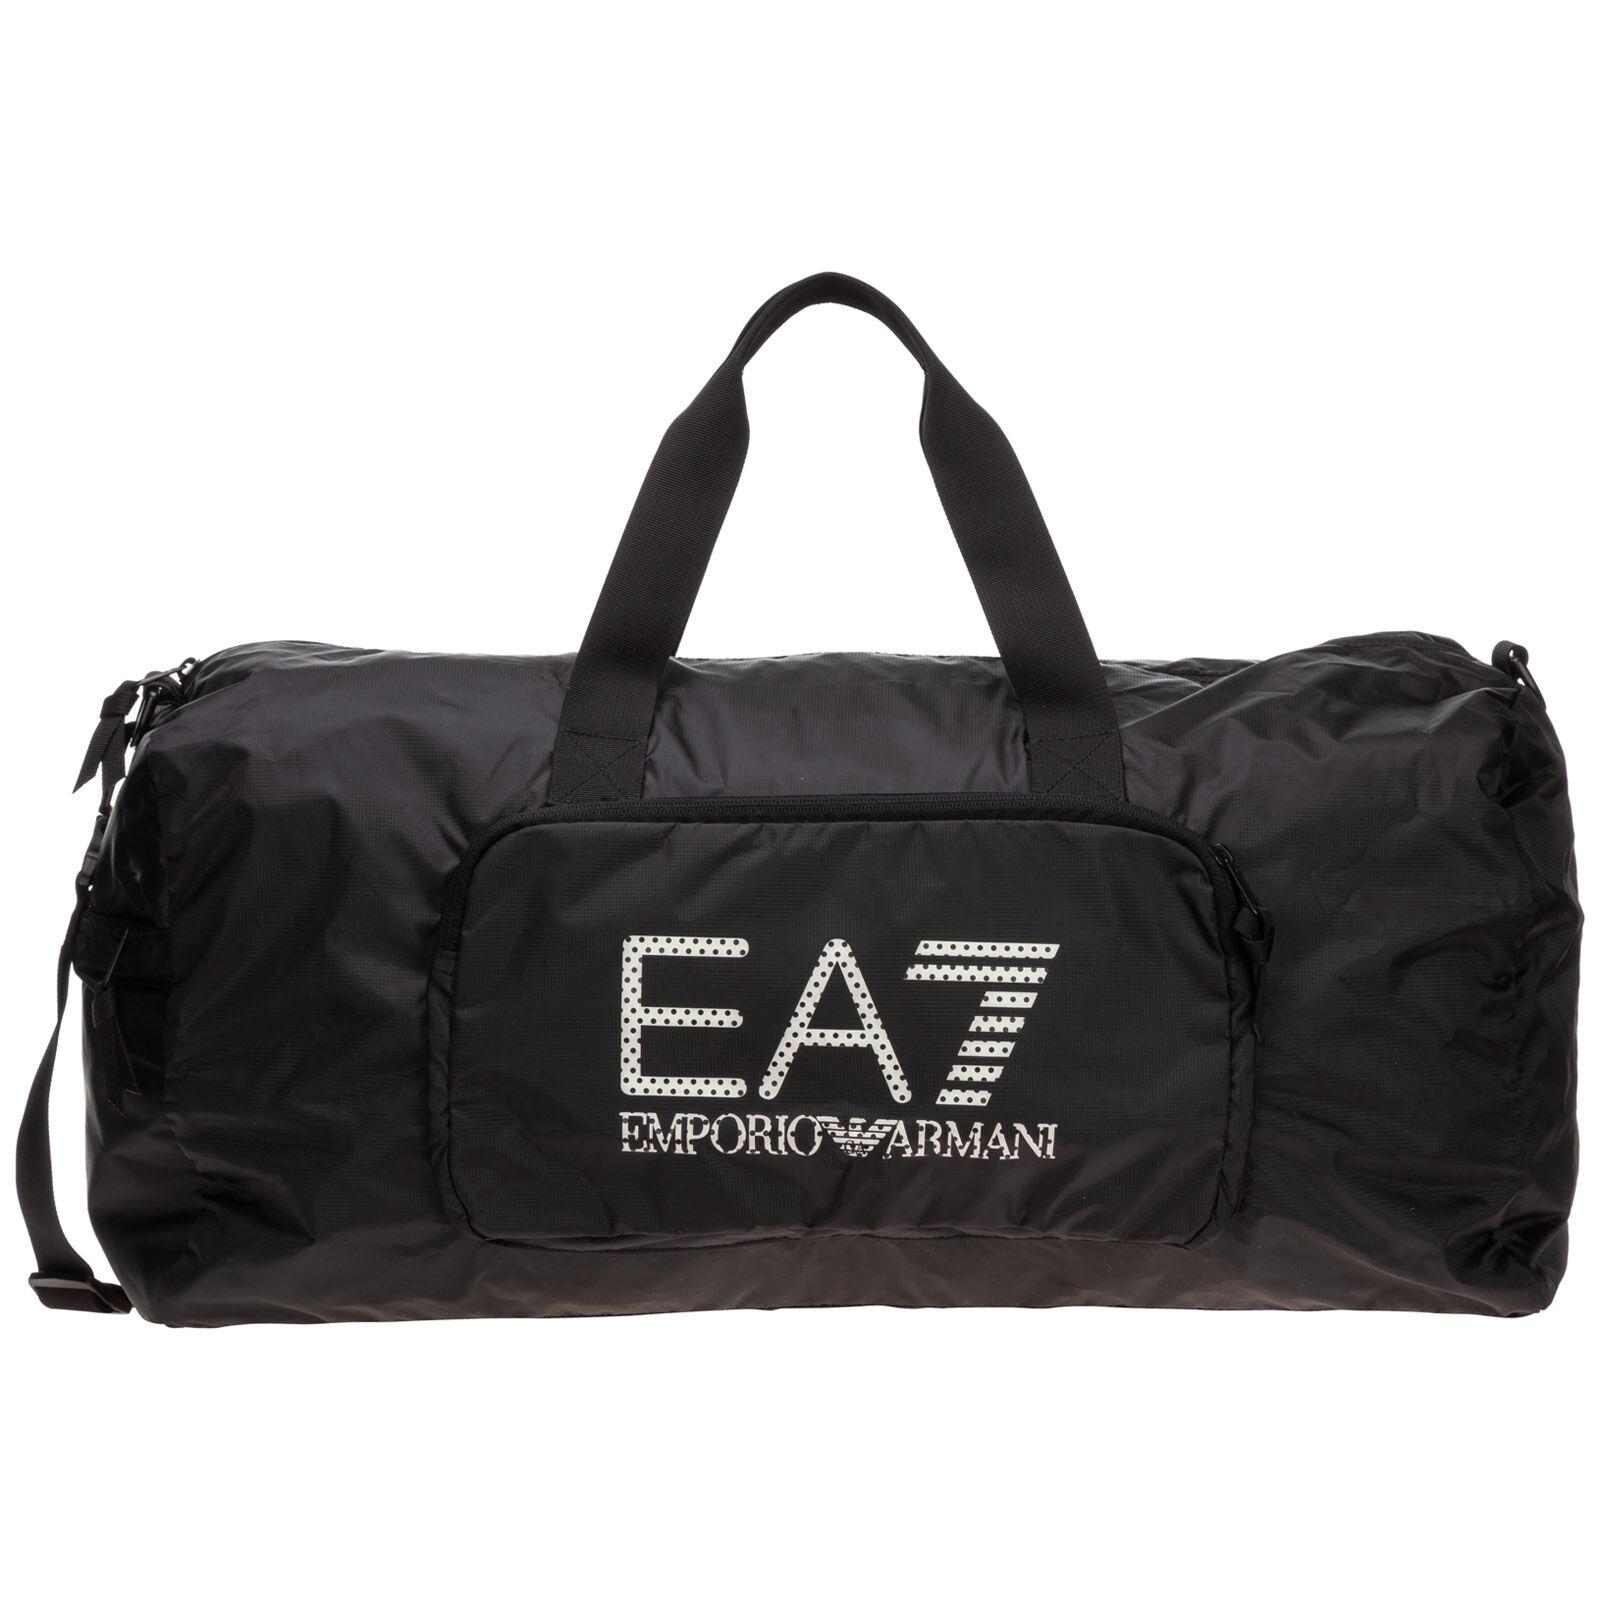 Emporio Armani Men's fitness gym sports shoulder bag nylon  - Black